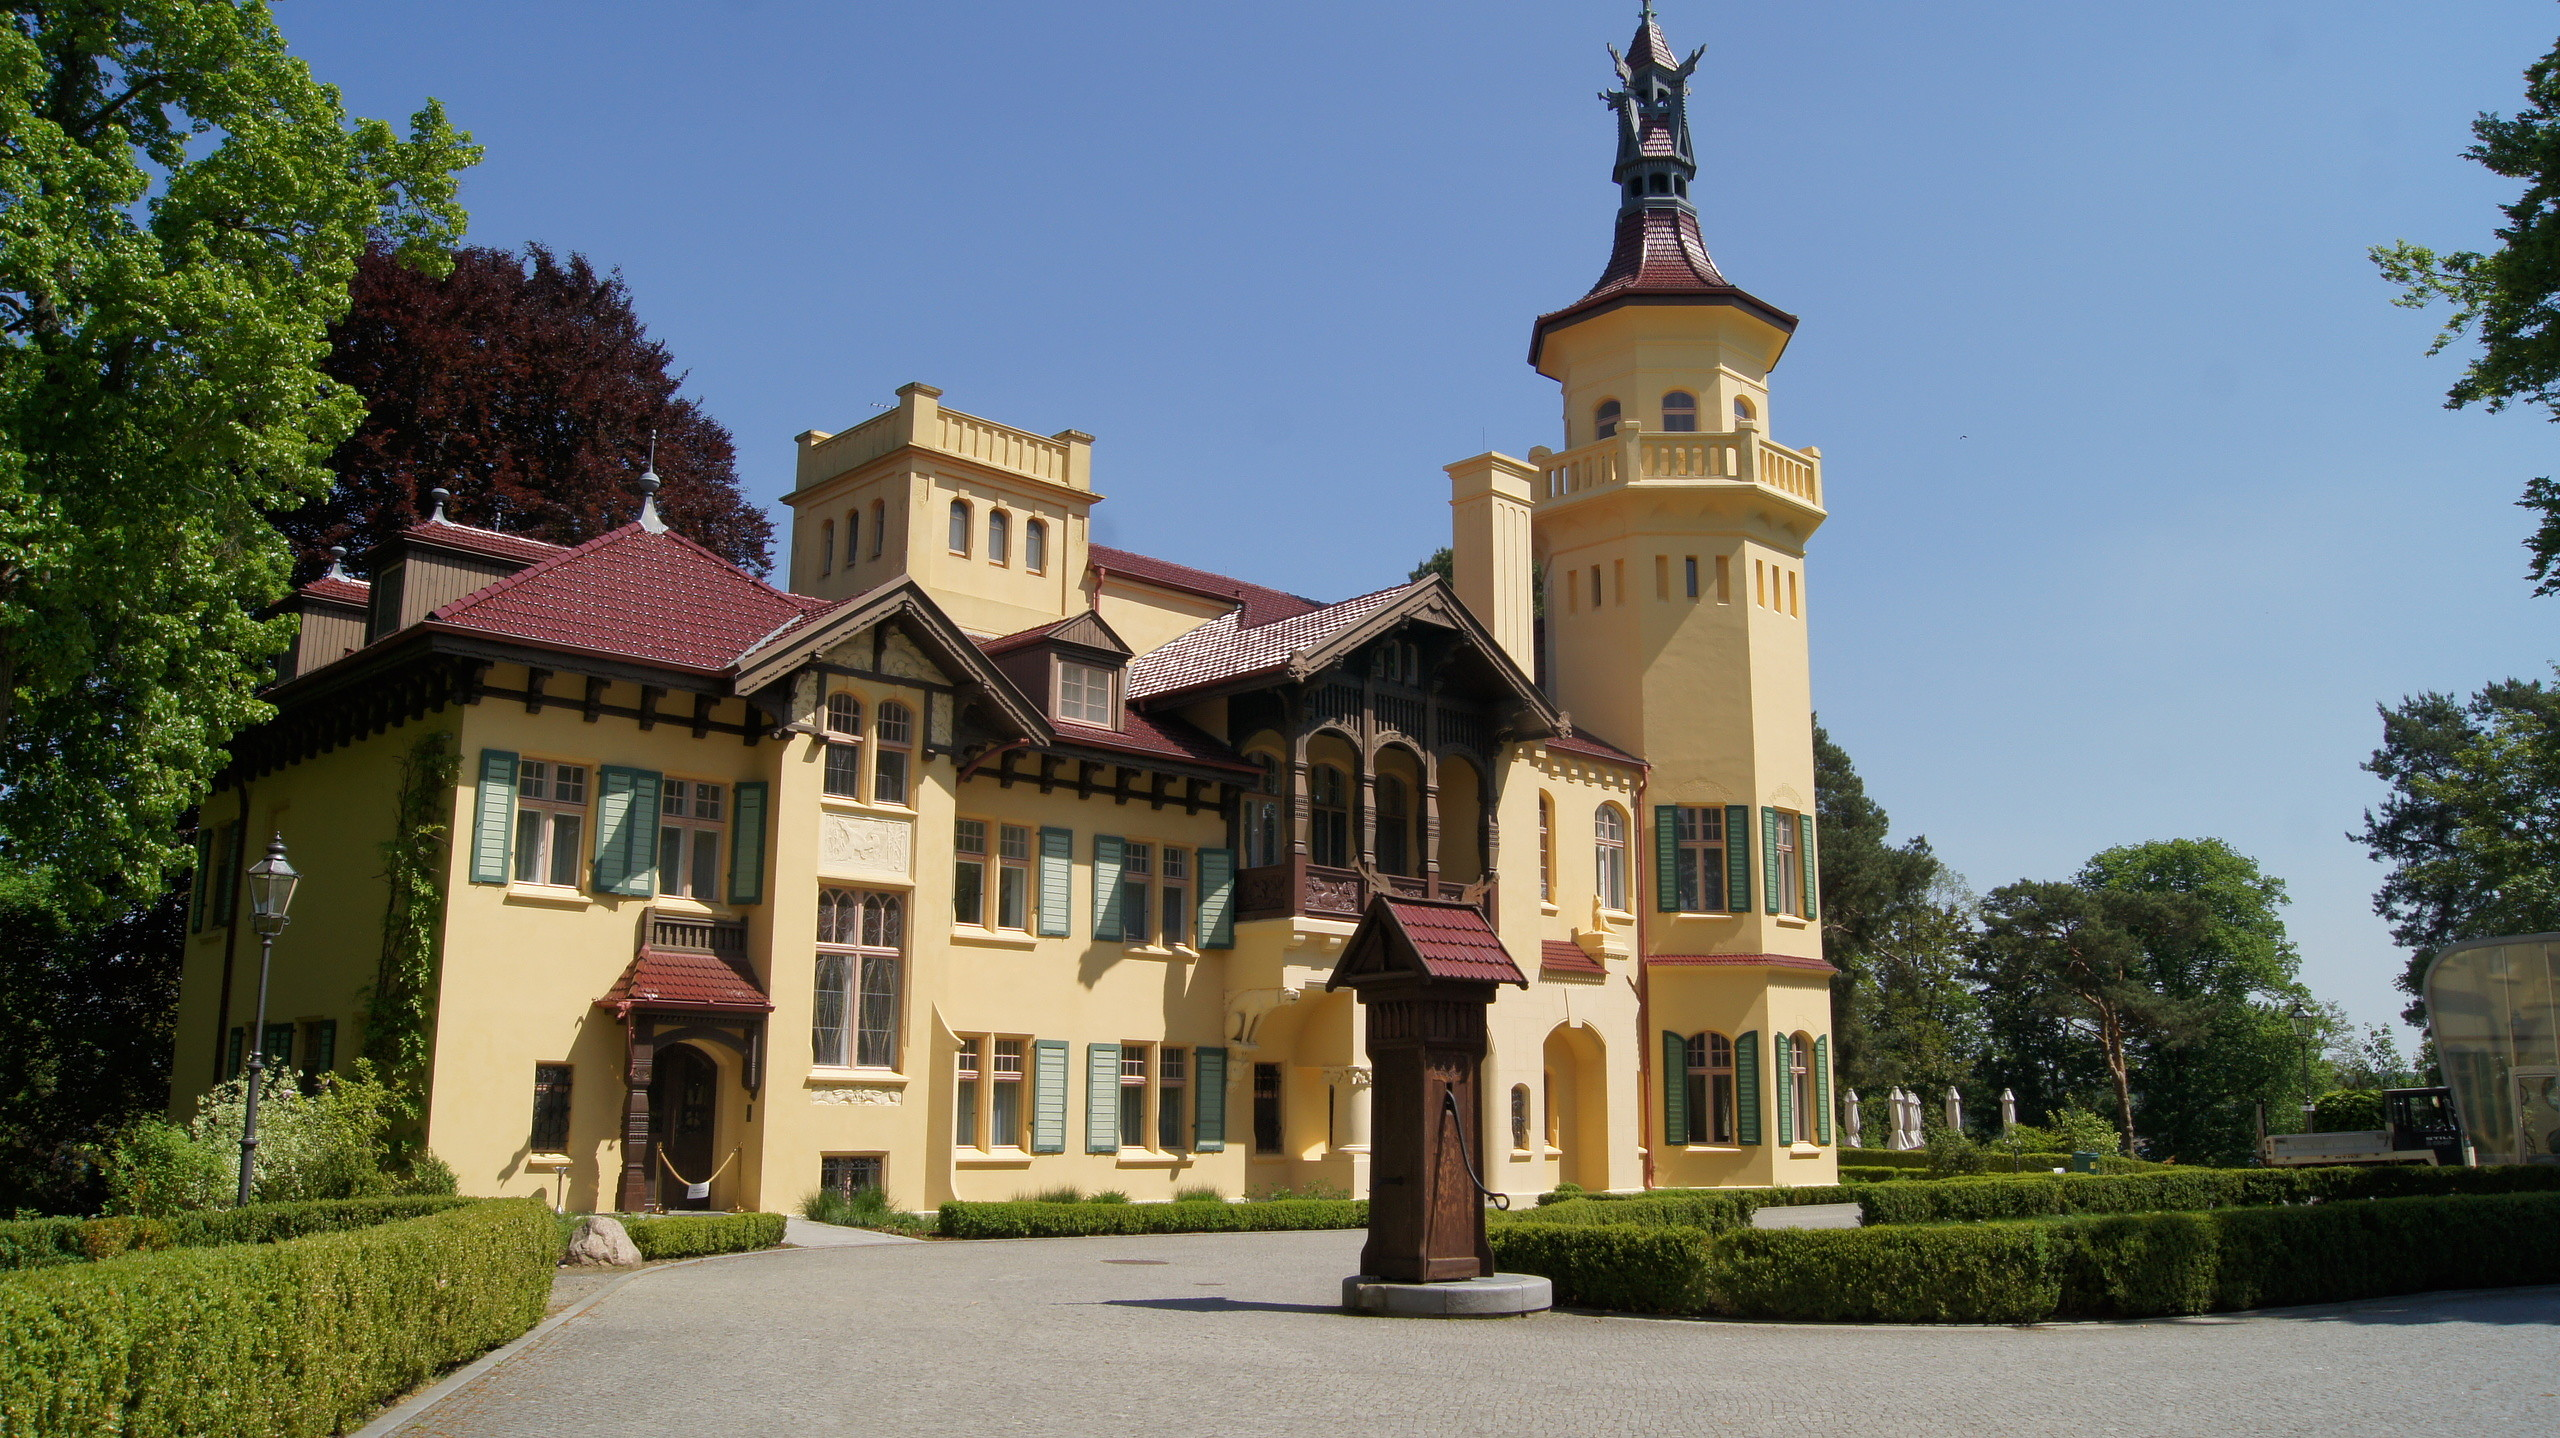 Schloß Hubertushöhe